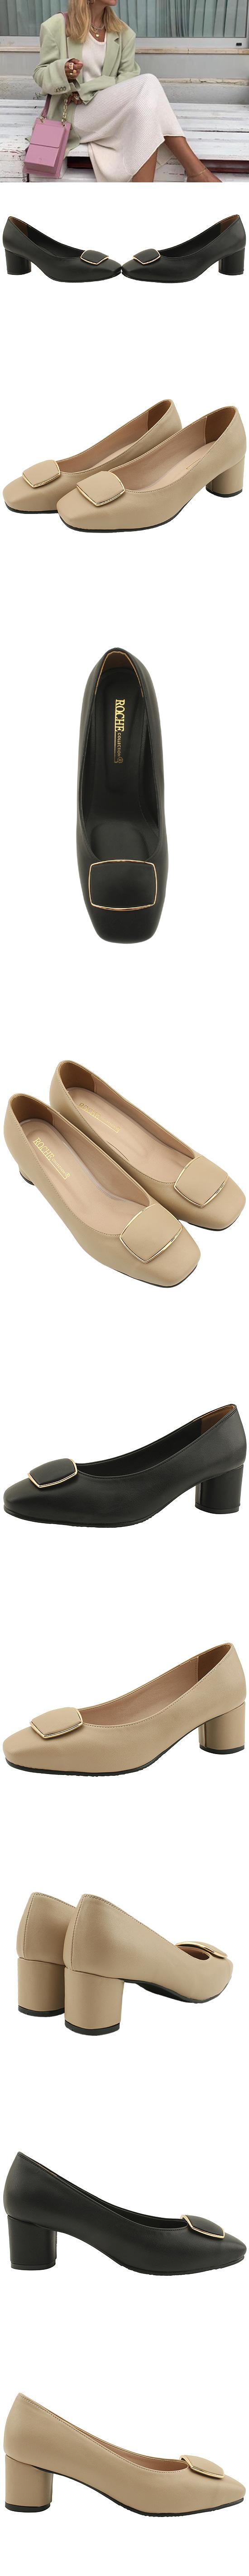 Modern Square Toe Full Heel Middle Heel Shoes Beige